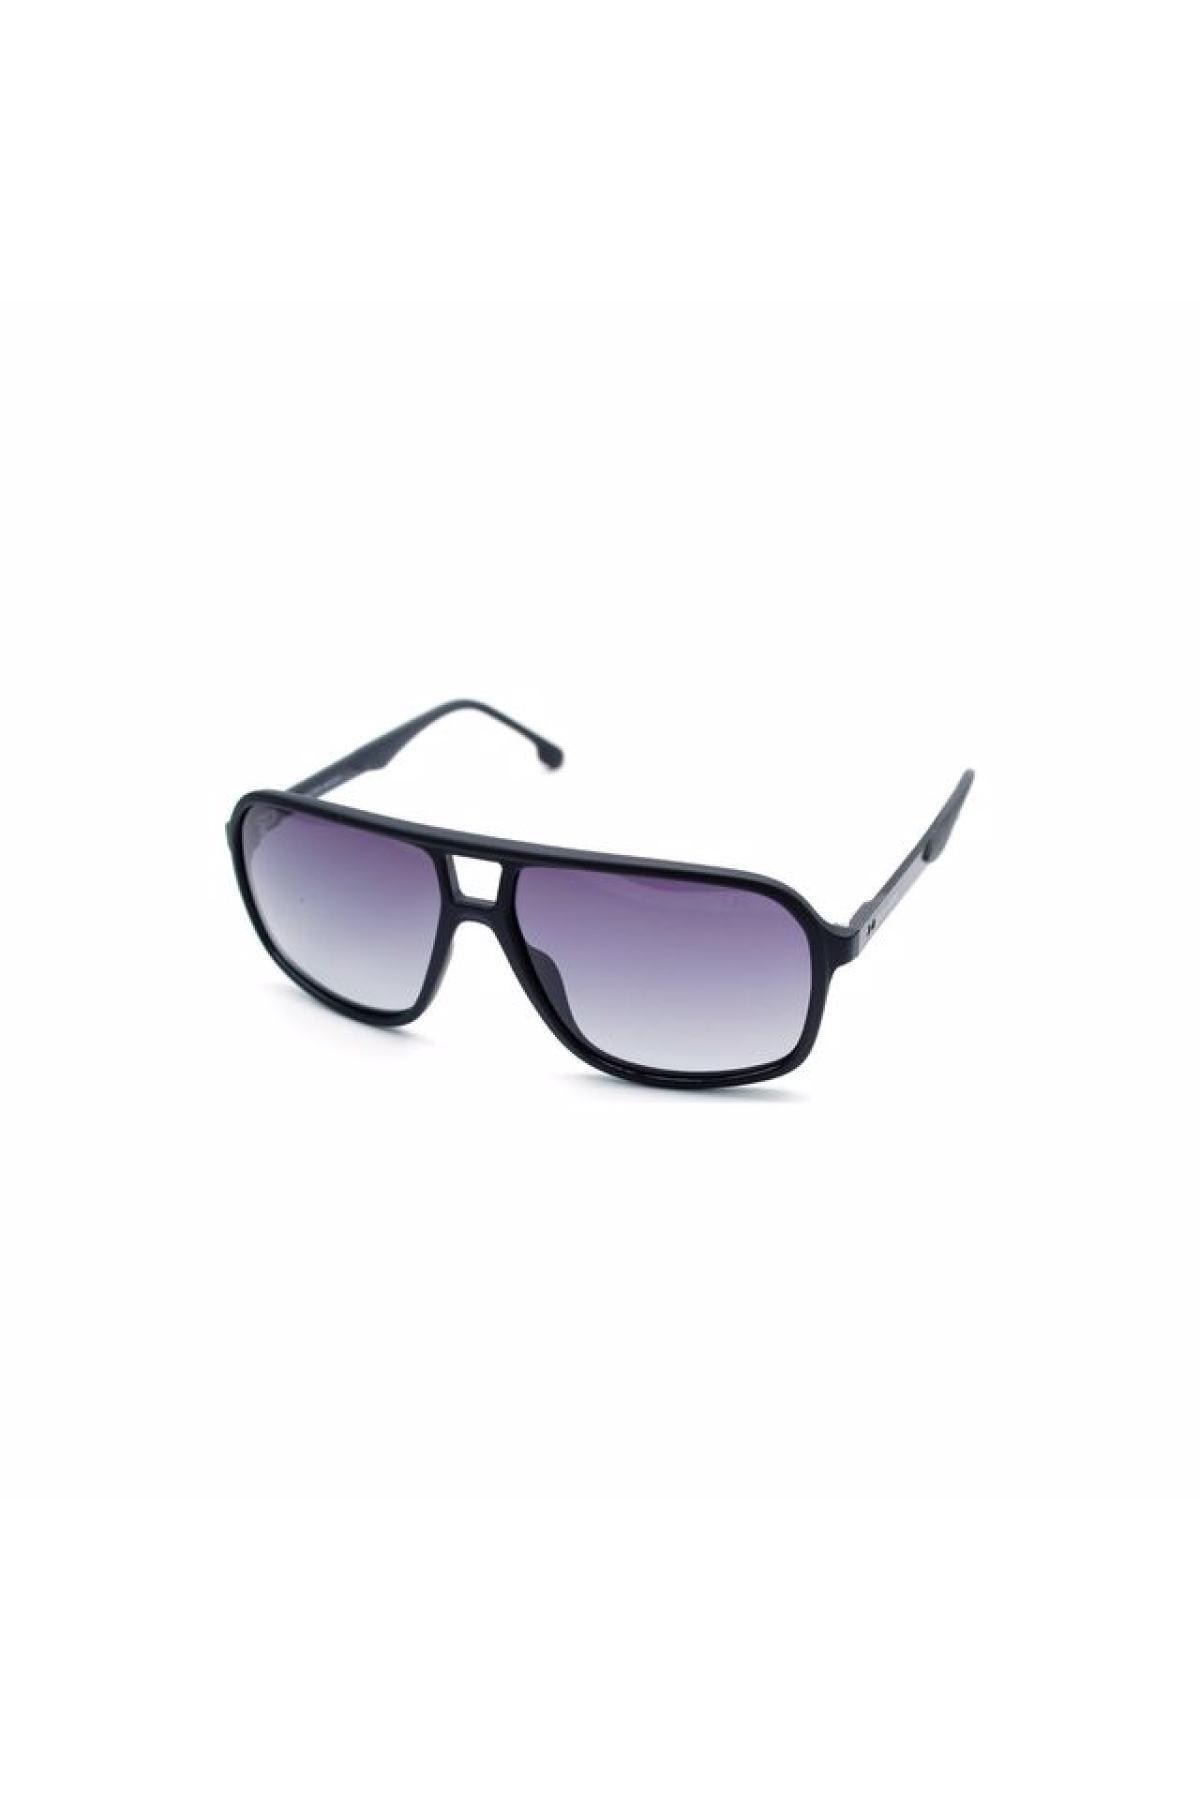 سفارش انلاین عینک آفتابی ساده برند LONDON&LONDON رنگ مشکی کد ty106462467